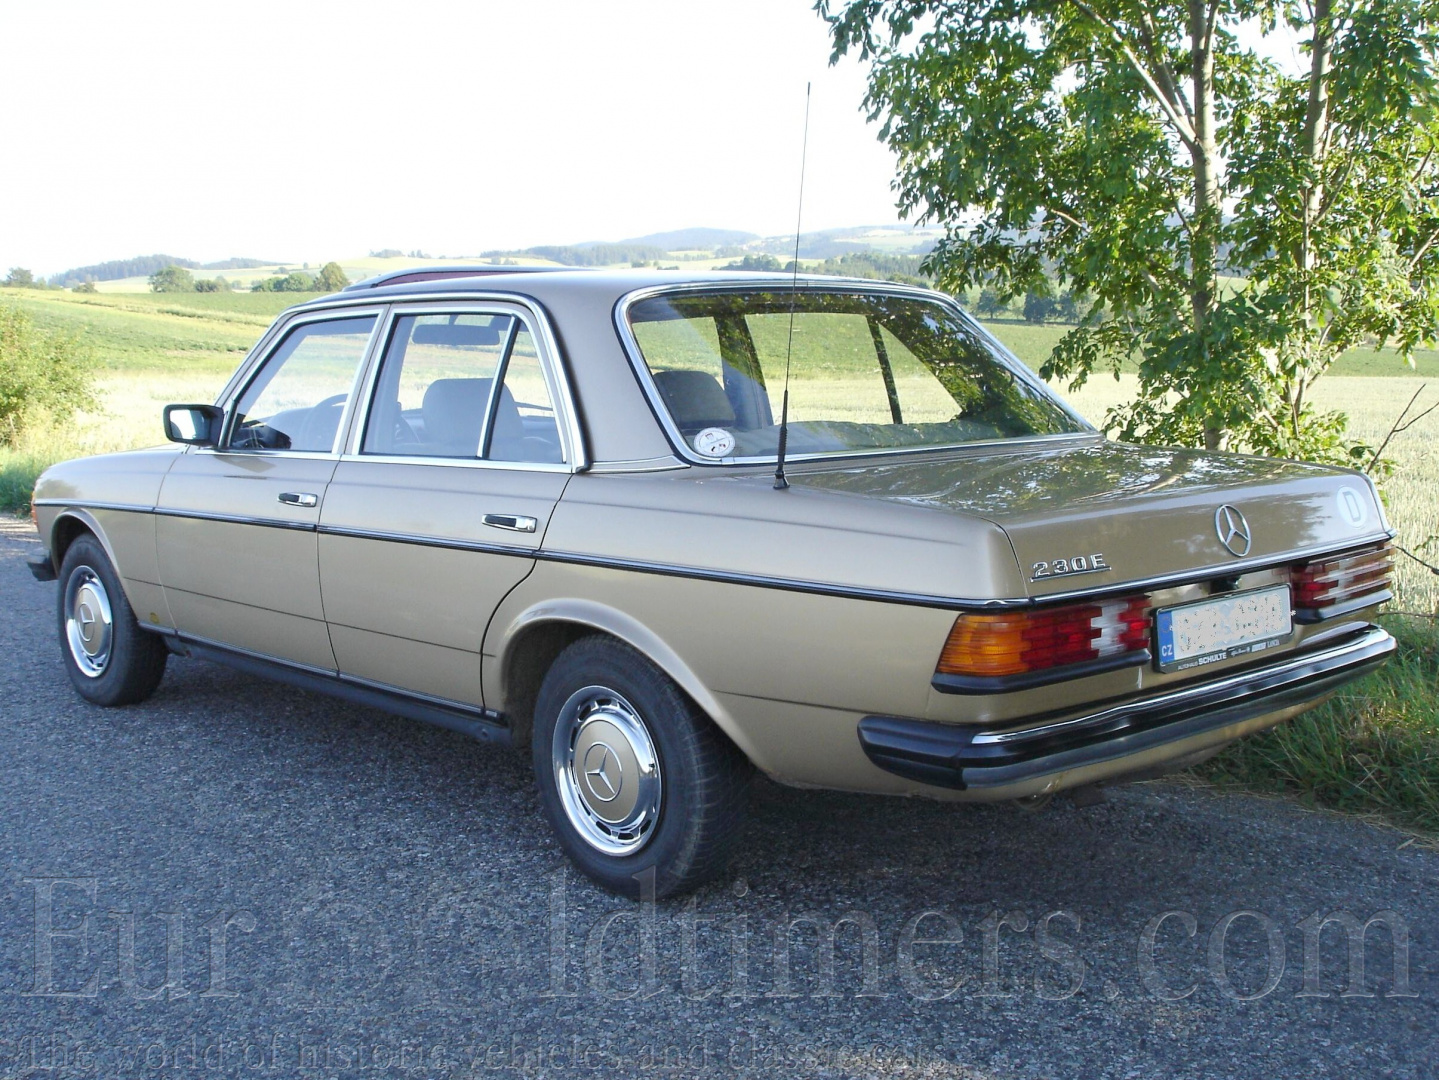 1981 mercedes benz 230 e w123 gallery veter ni i for Mercedes benz w123 parts